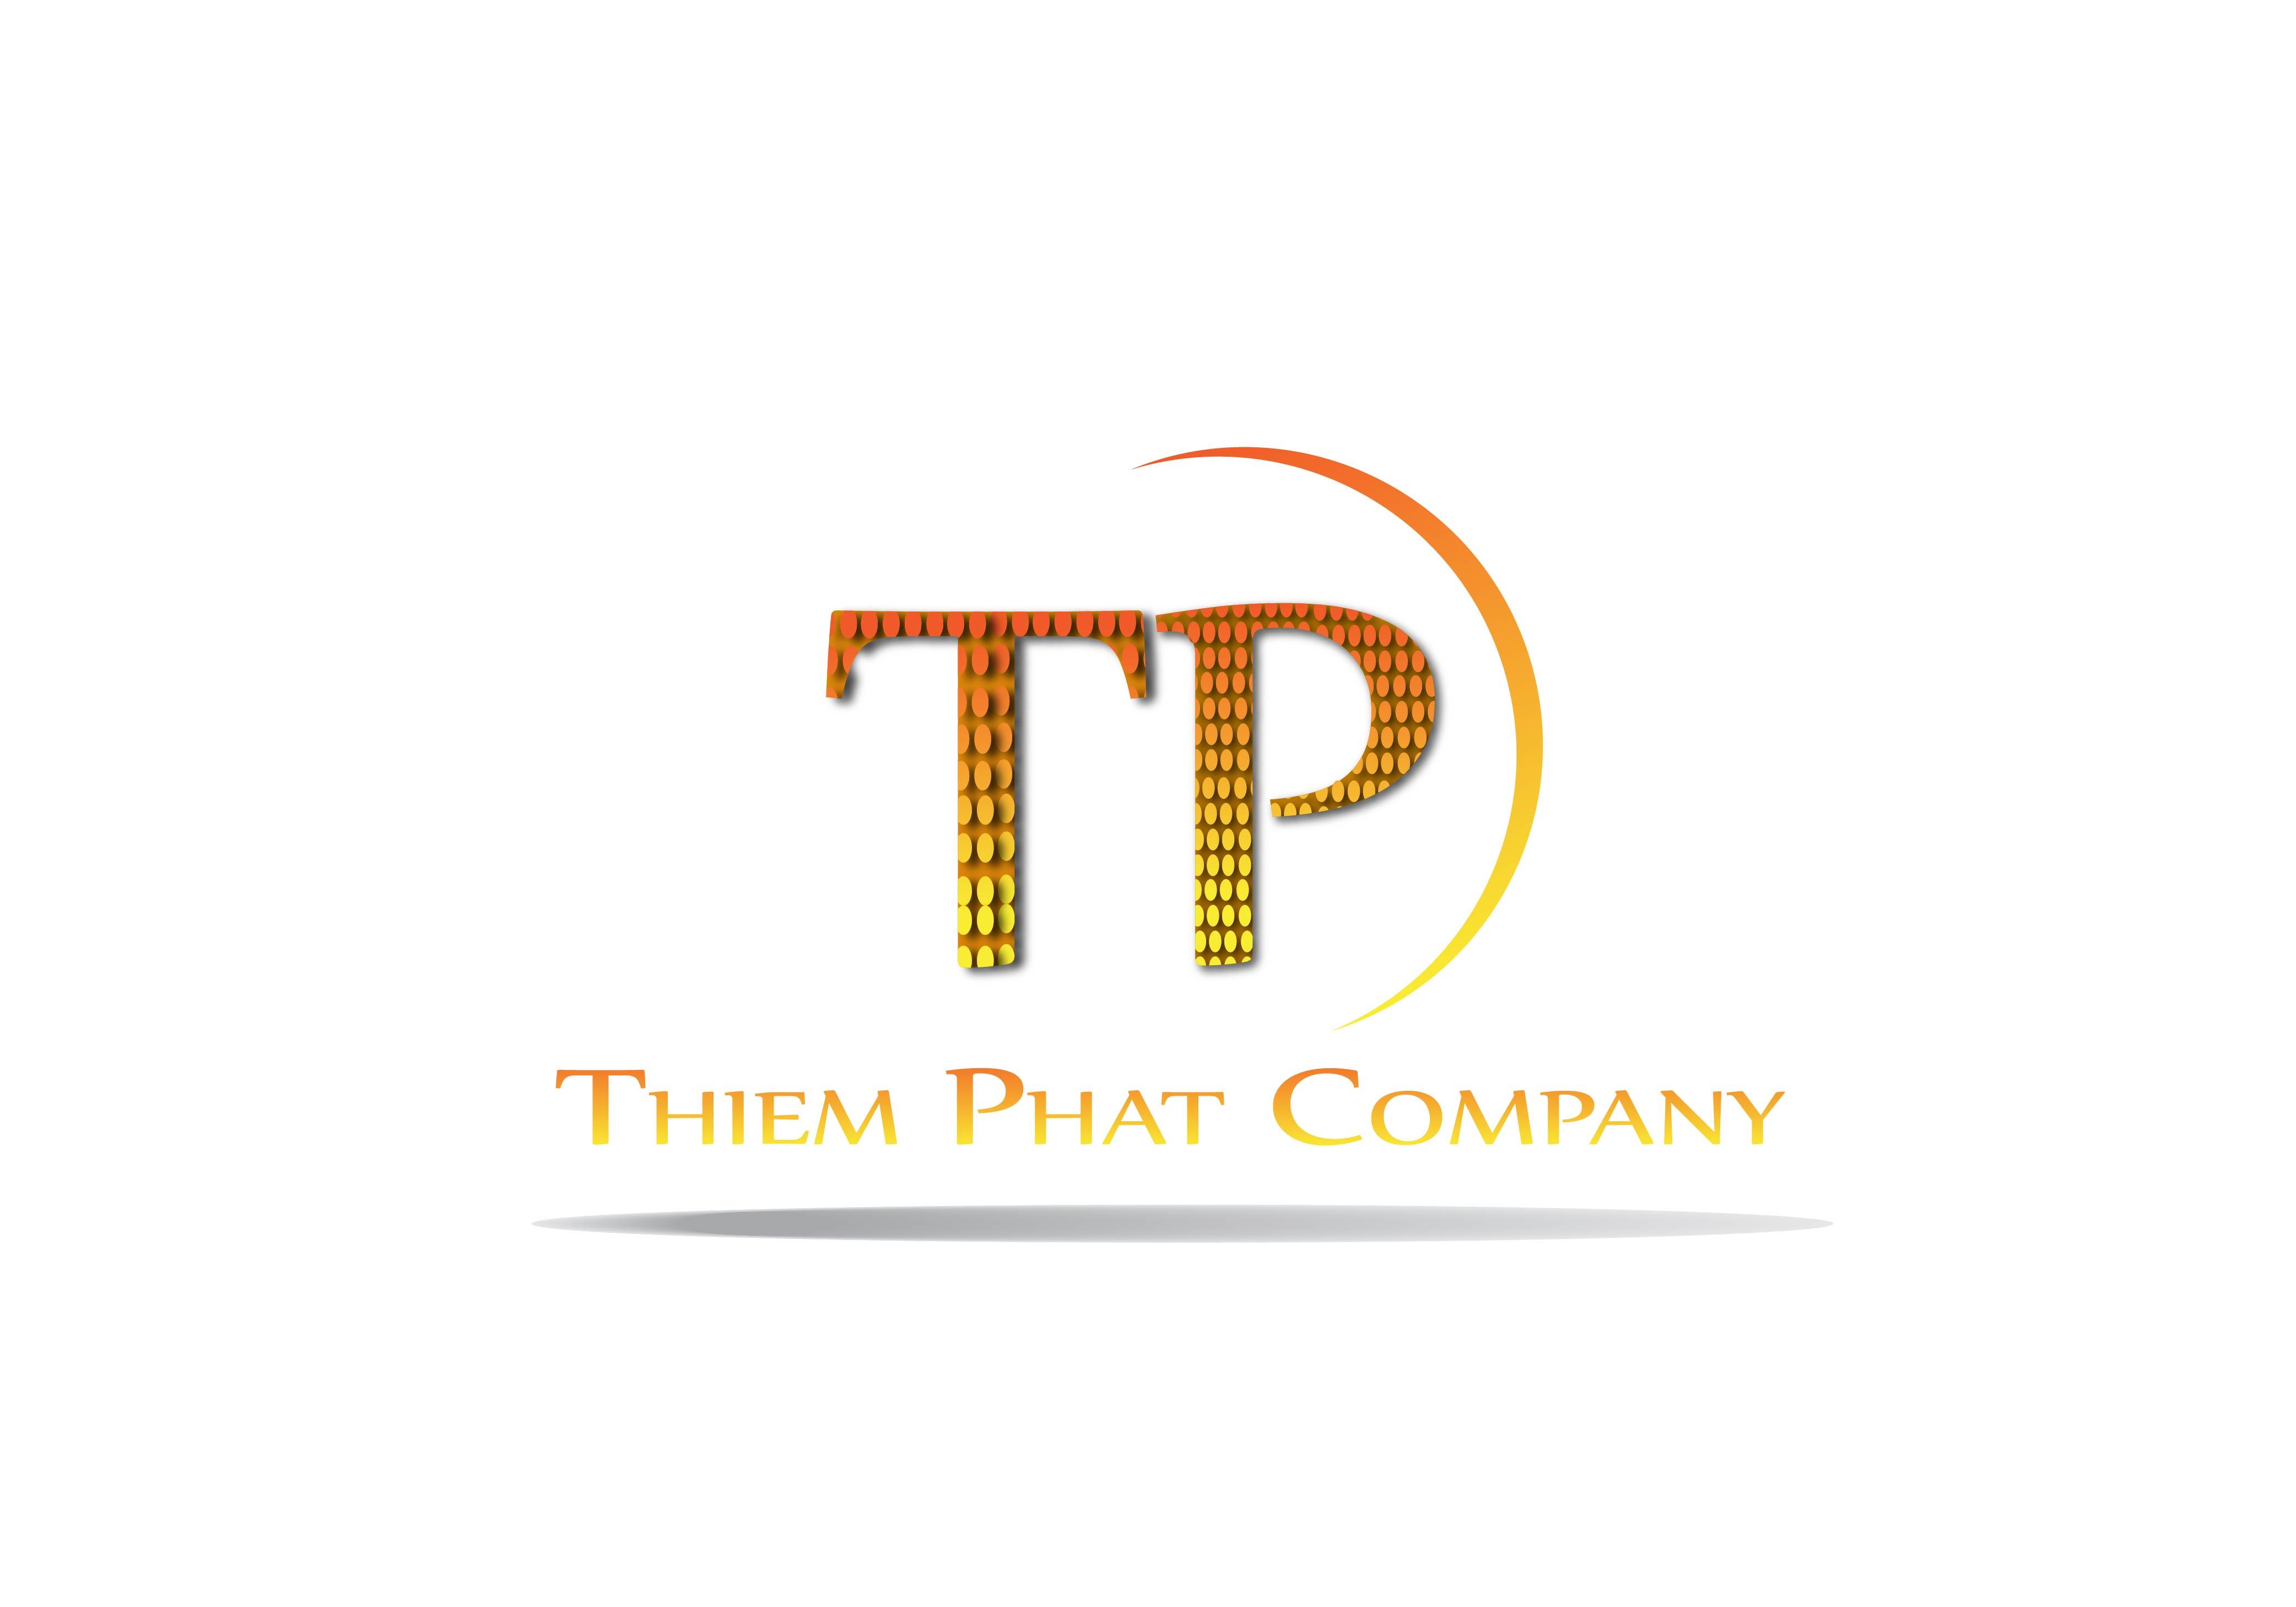 Logo Design by Bilal Baloch - Entry No. 2 in the Logo Design Contest New Logo Design for Thiem Phat company.